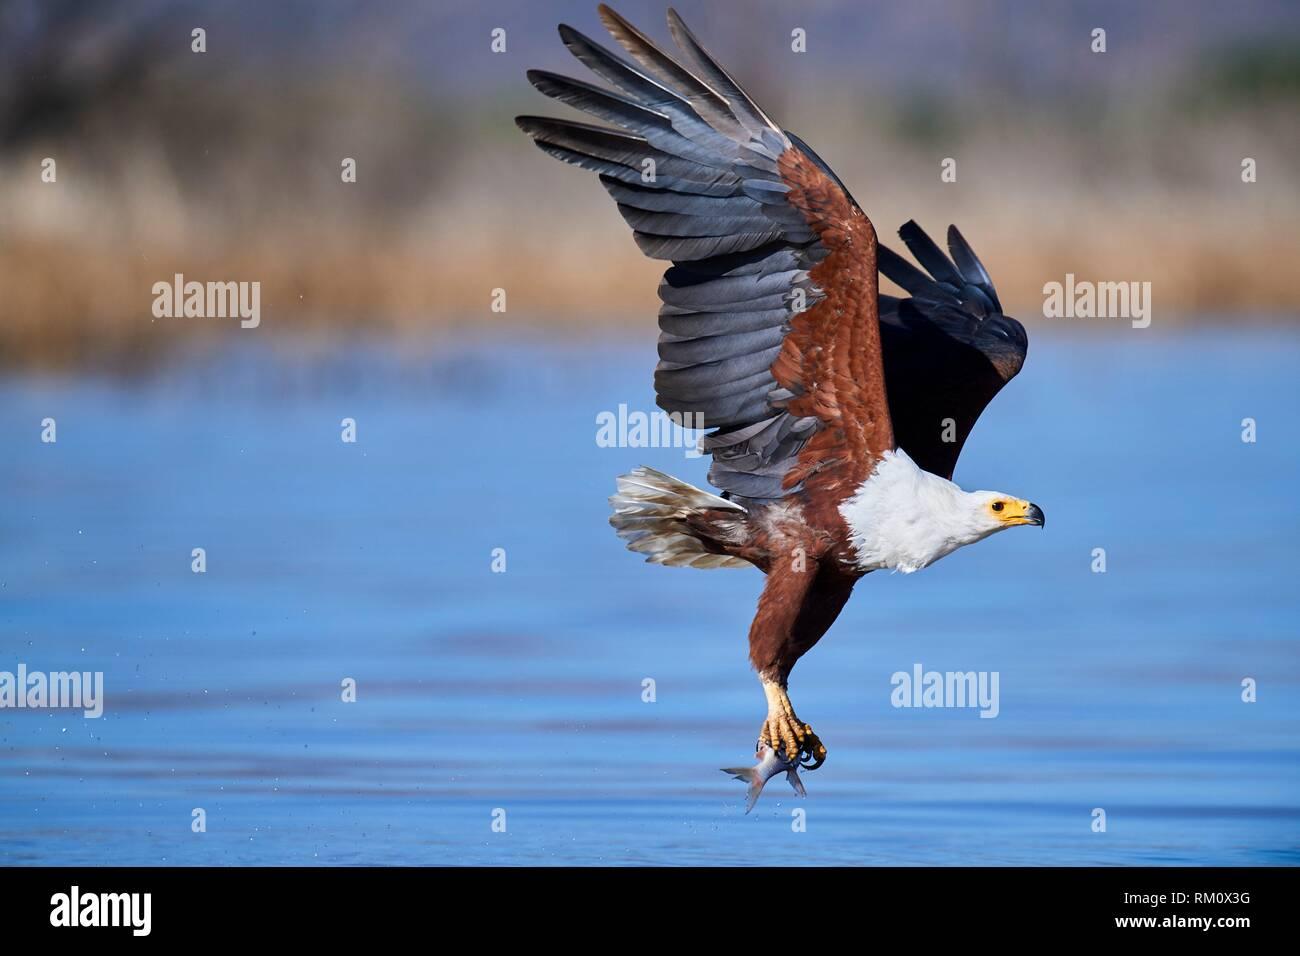 African fish eagle (Haliaeetus vocifer) fishing, Baringo lake, Kenya, Africa. Stock Photo